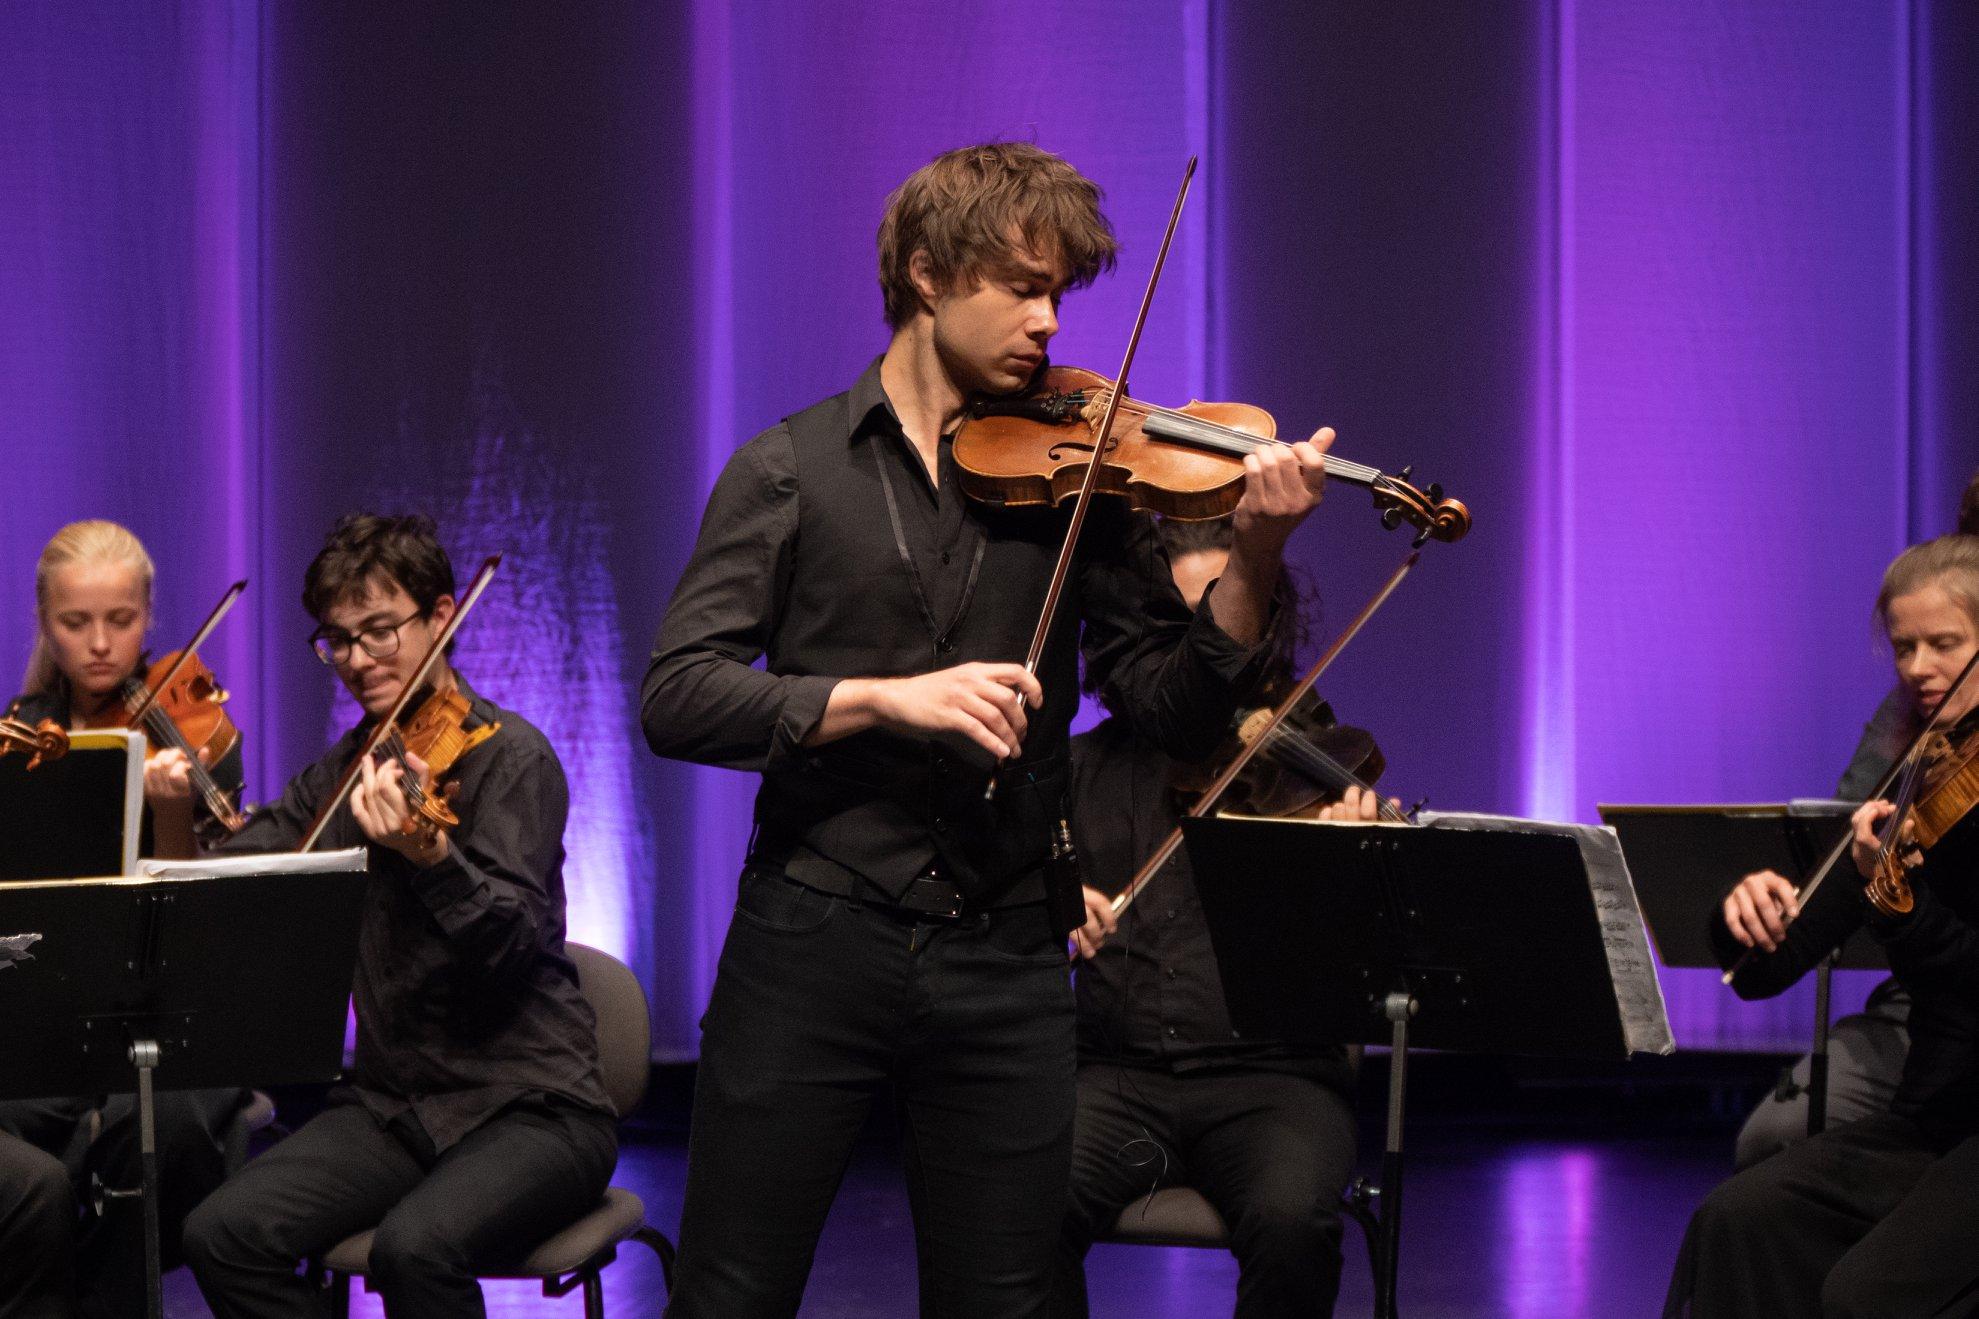 Rybak and Bilan will sing a duet for the Muz-TV awards 05/28/2009 18